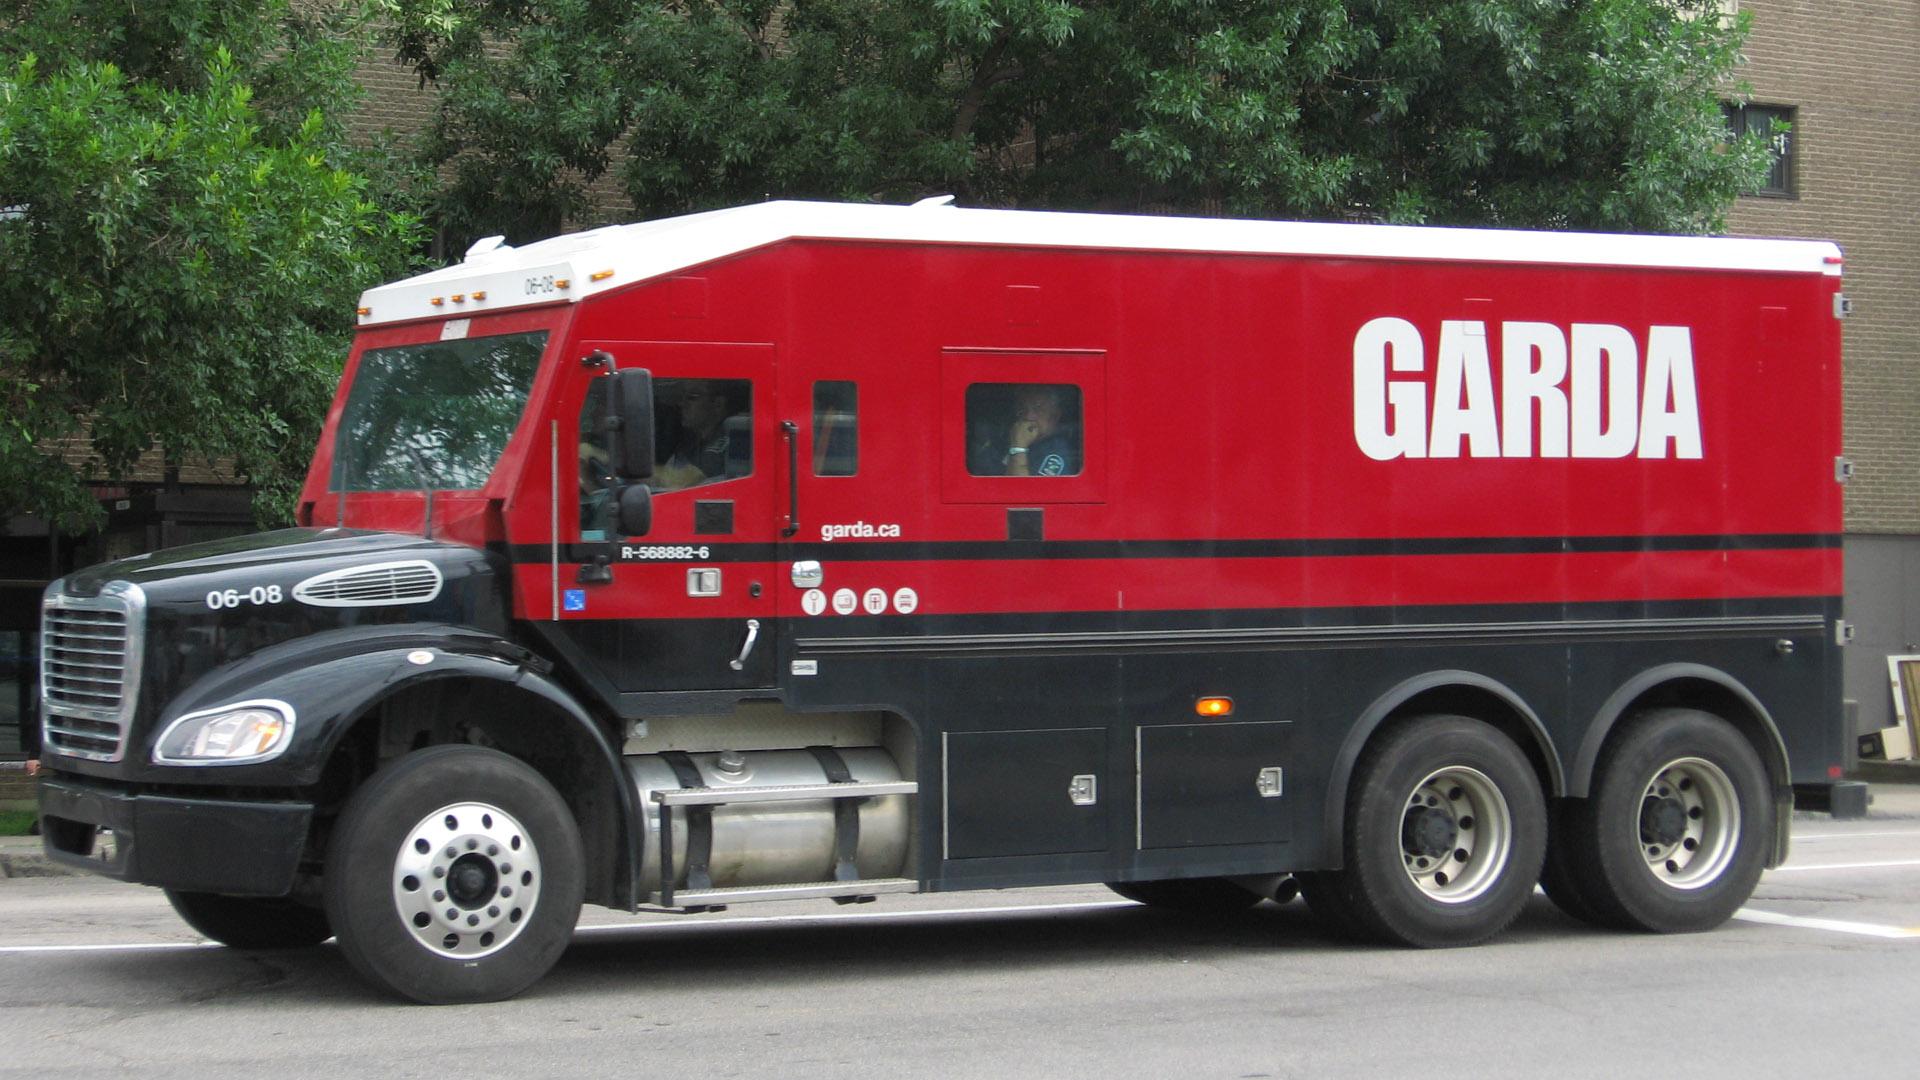 Garda Armored Car Related Keywords - Garda Armored Car Long Tail ...